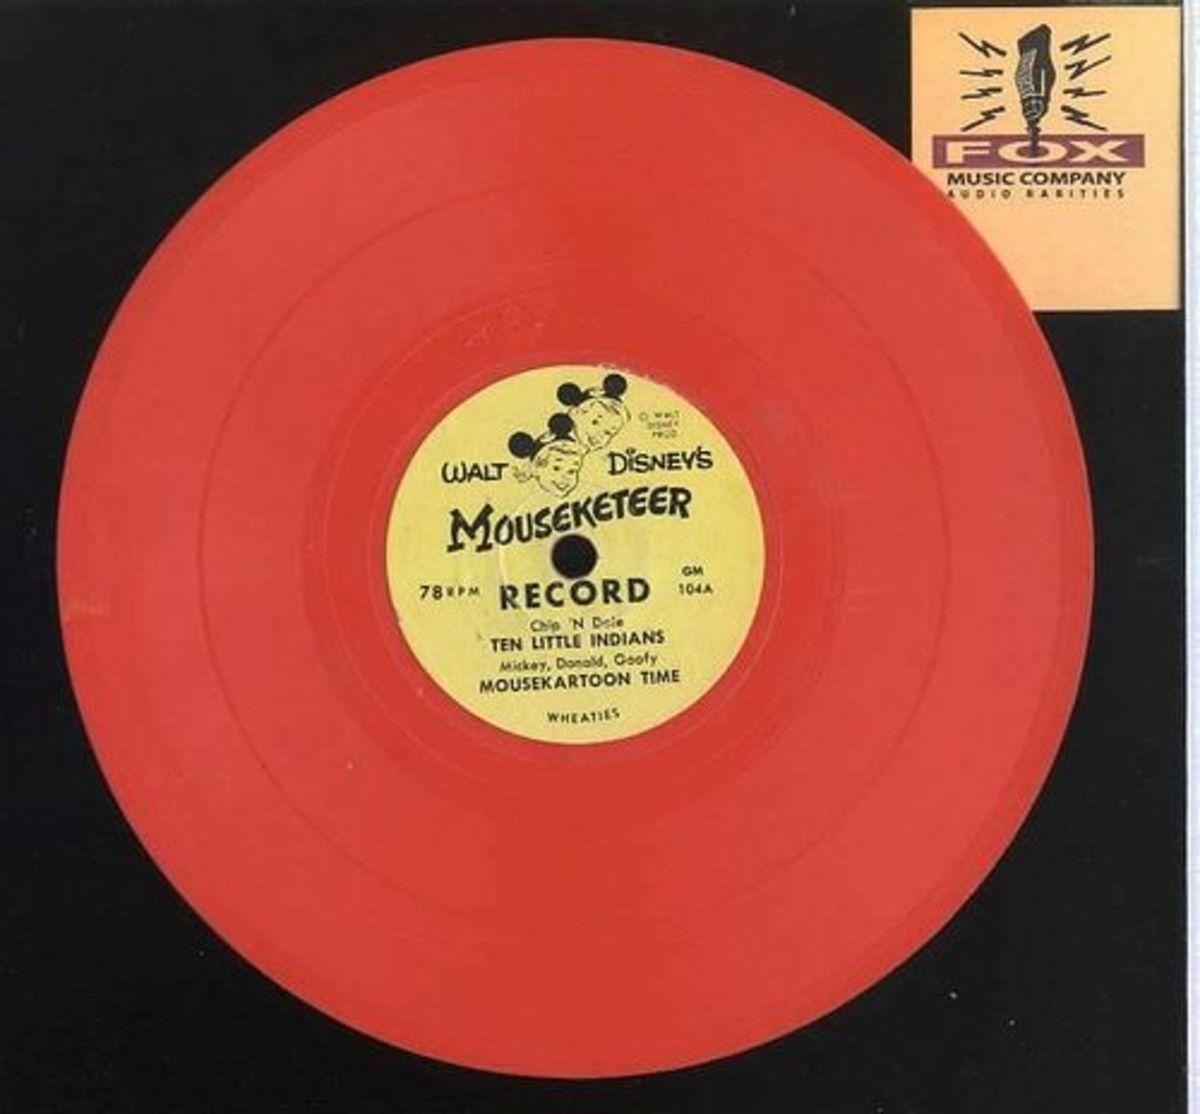 Walt Disneys Mouseketeer Record GM 104 Orange Vinyl 78 rpm Record